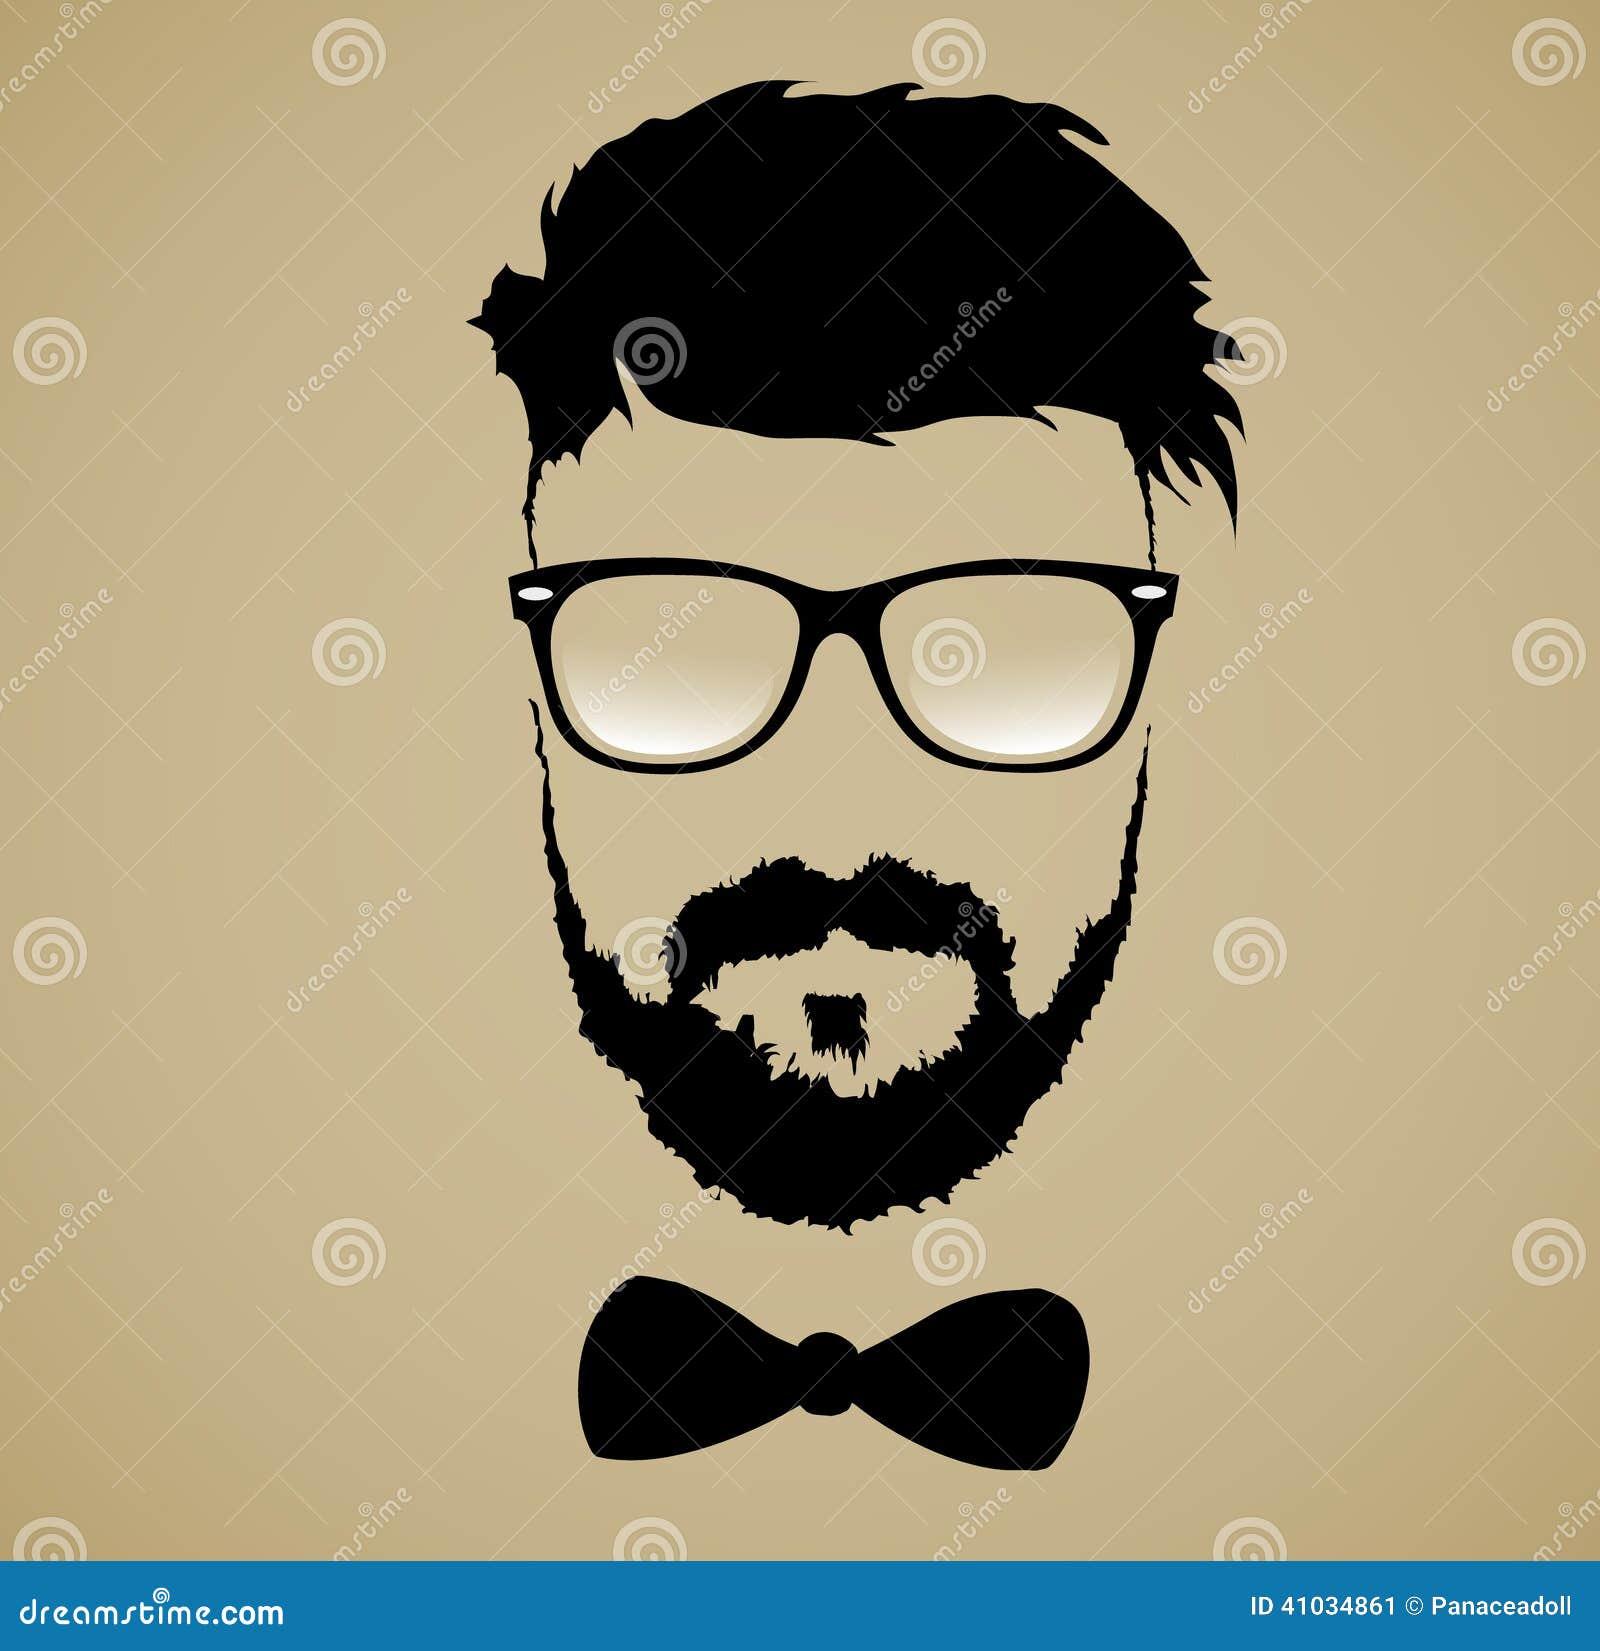 1f6f6d47e9d Mustache Beard Glasses Hairstyle Stock Vector - Illustration of ...